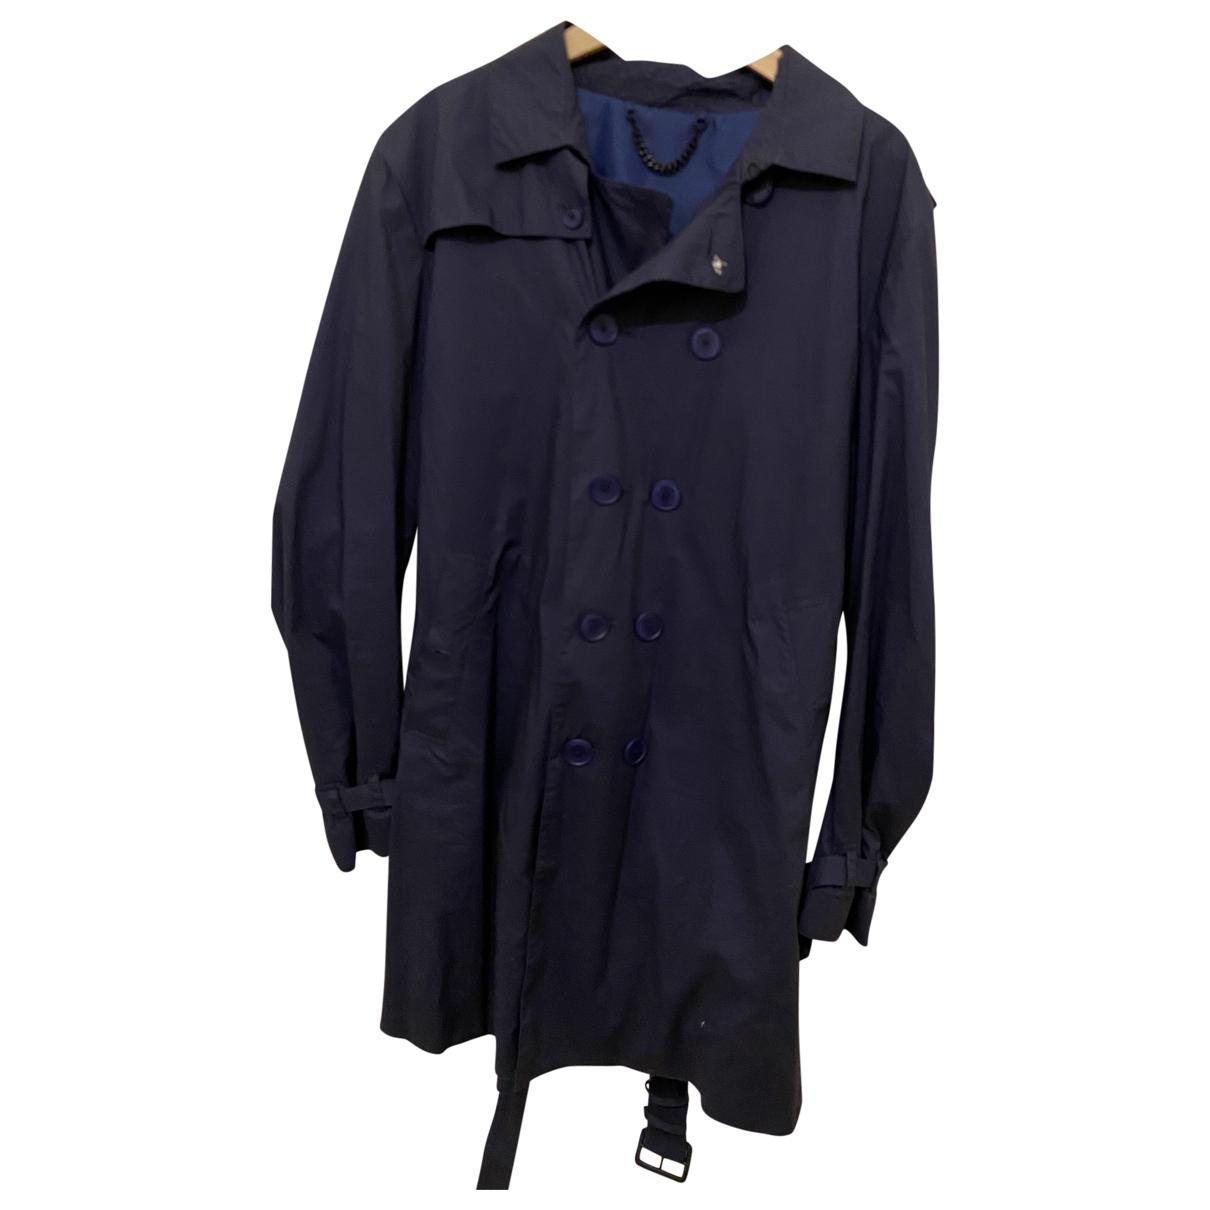 Paul Smith \N Navy Cotton coat  for Men L International